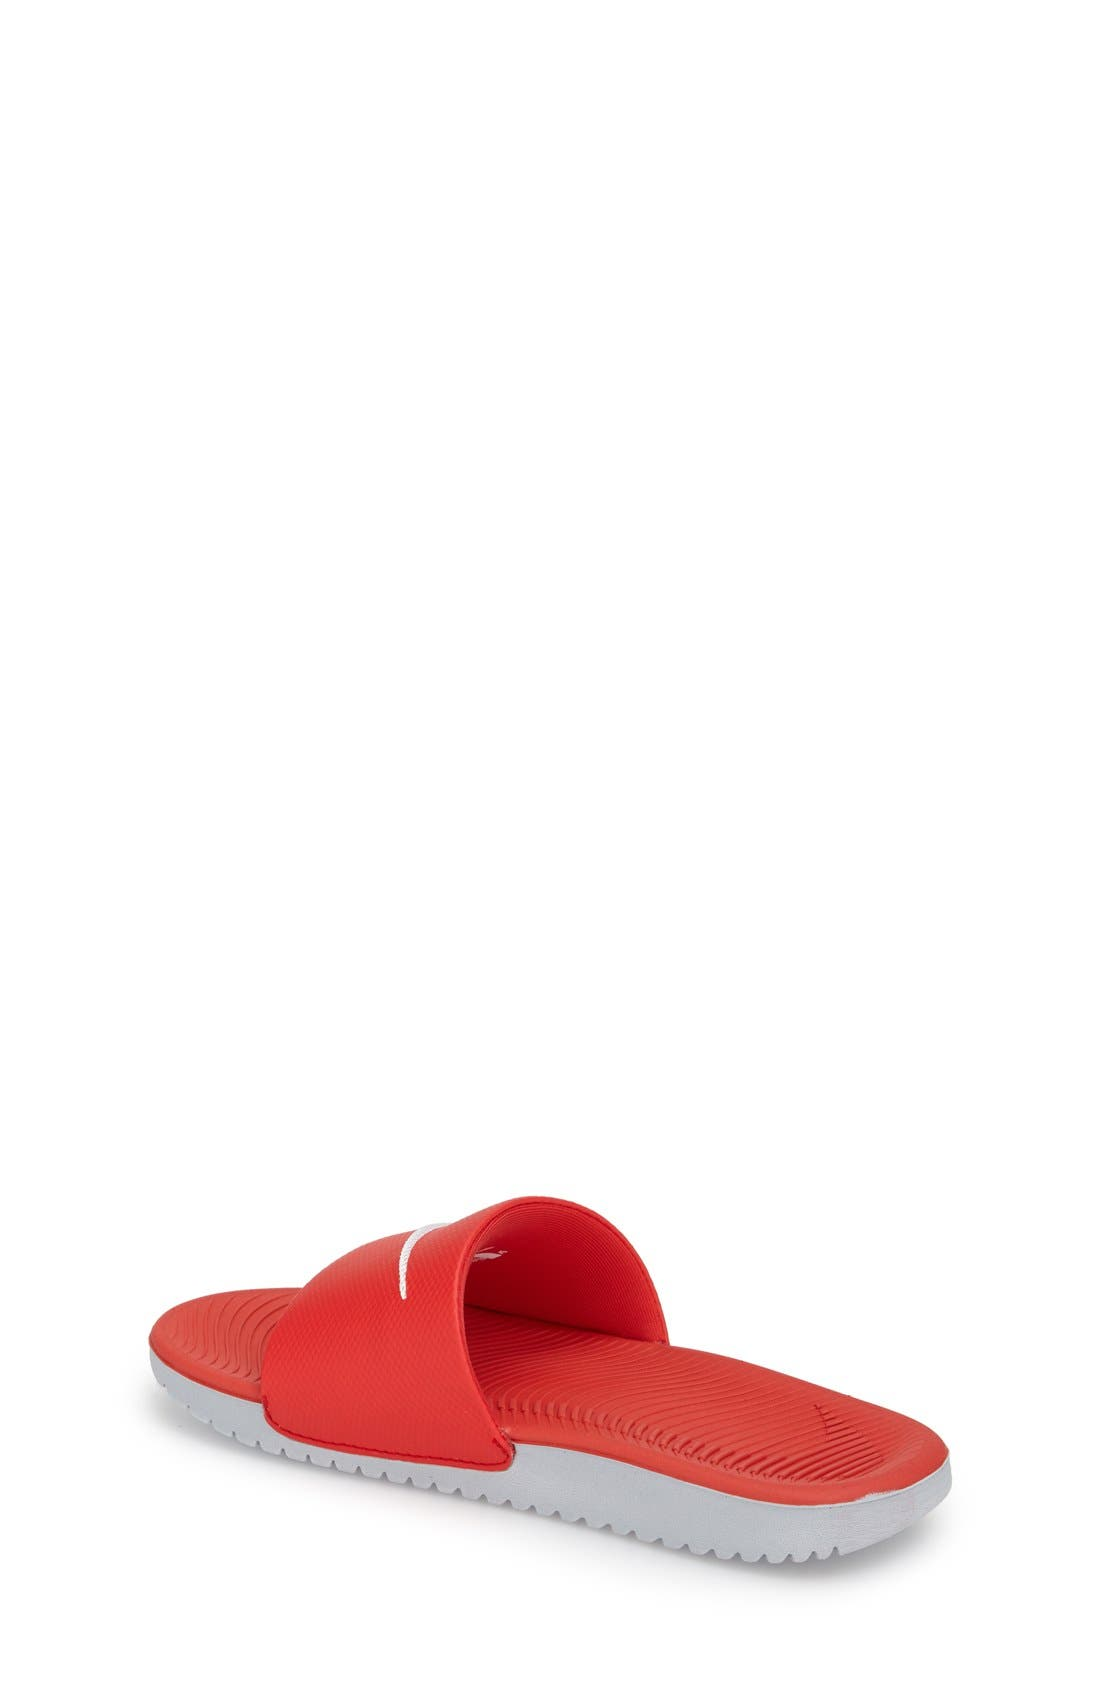 'Kawa' Slide Sandal,                             Alternate thumbnail 3, color,                             UNIVERSITY RED/ WHITE